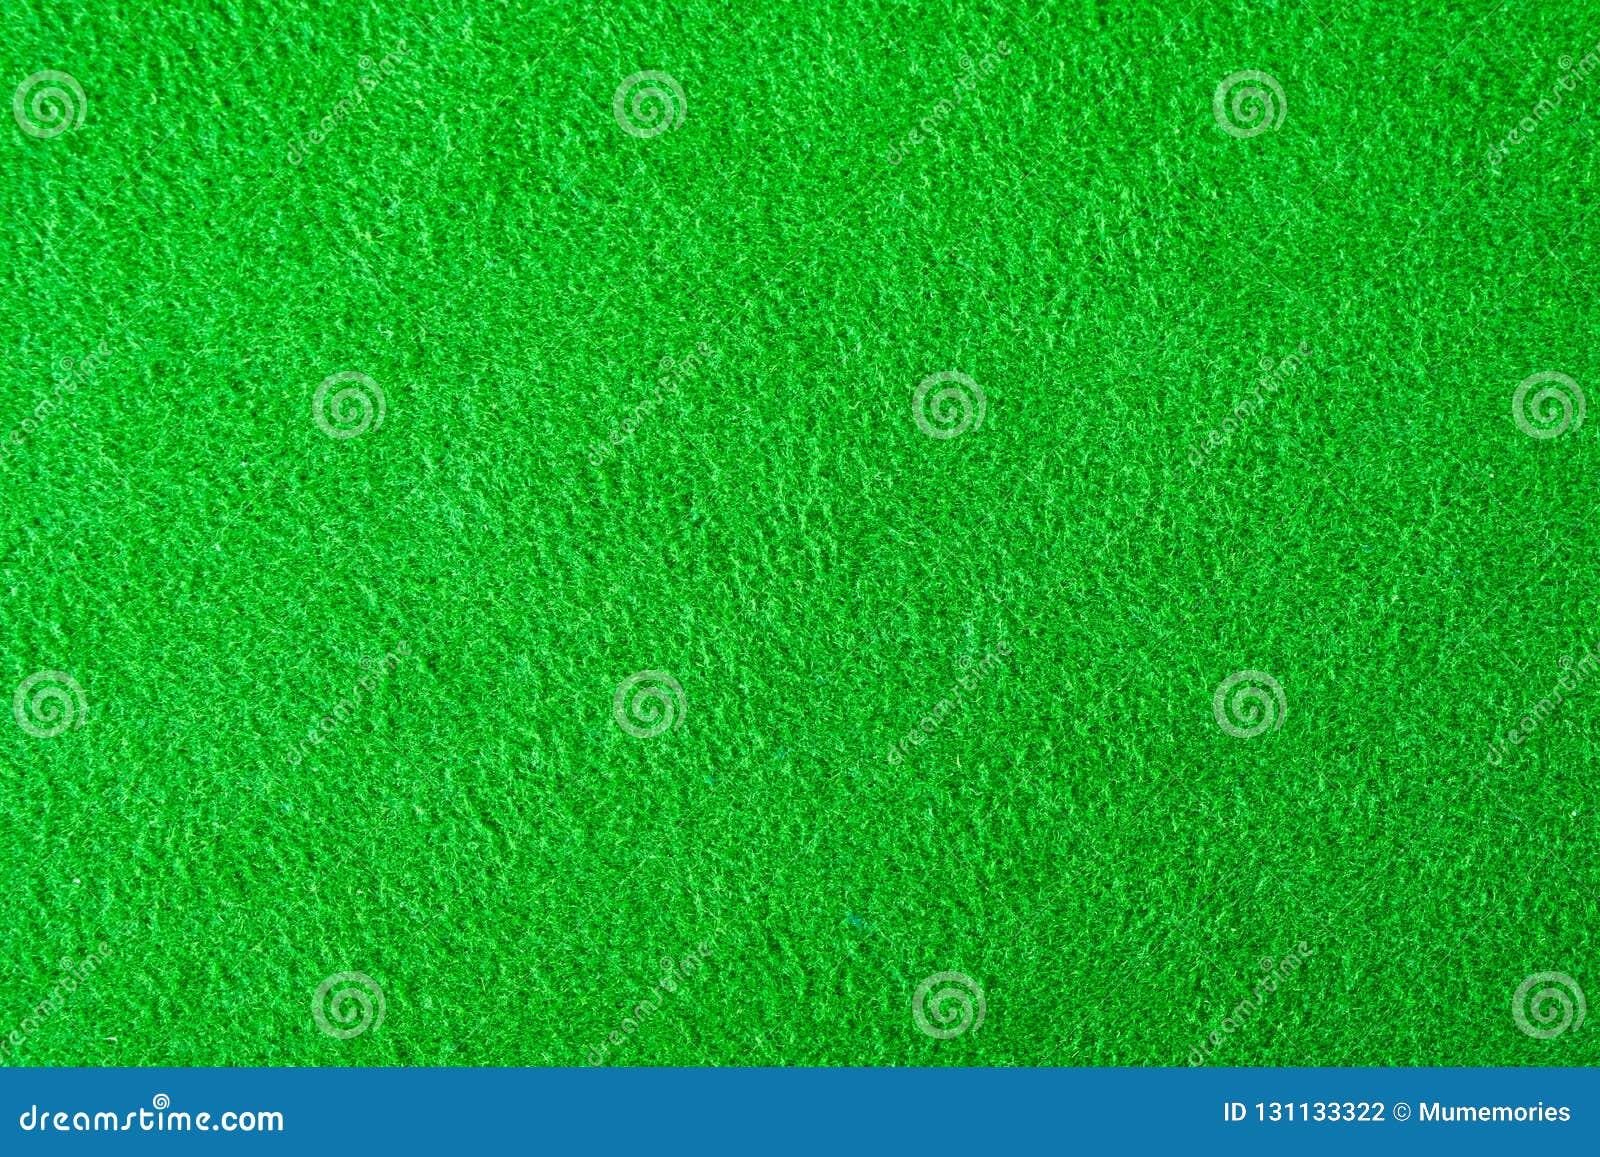 Wondrous Green Felt Fabric Texture For Background Stock Photo Image Download Free Architecture Designs Scobabritishbridgeorg